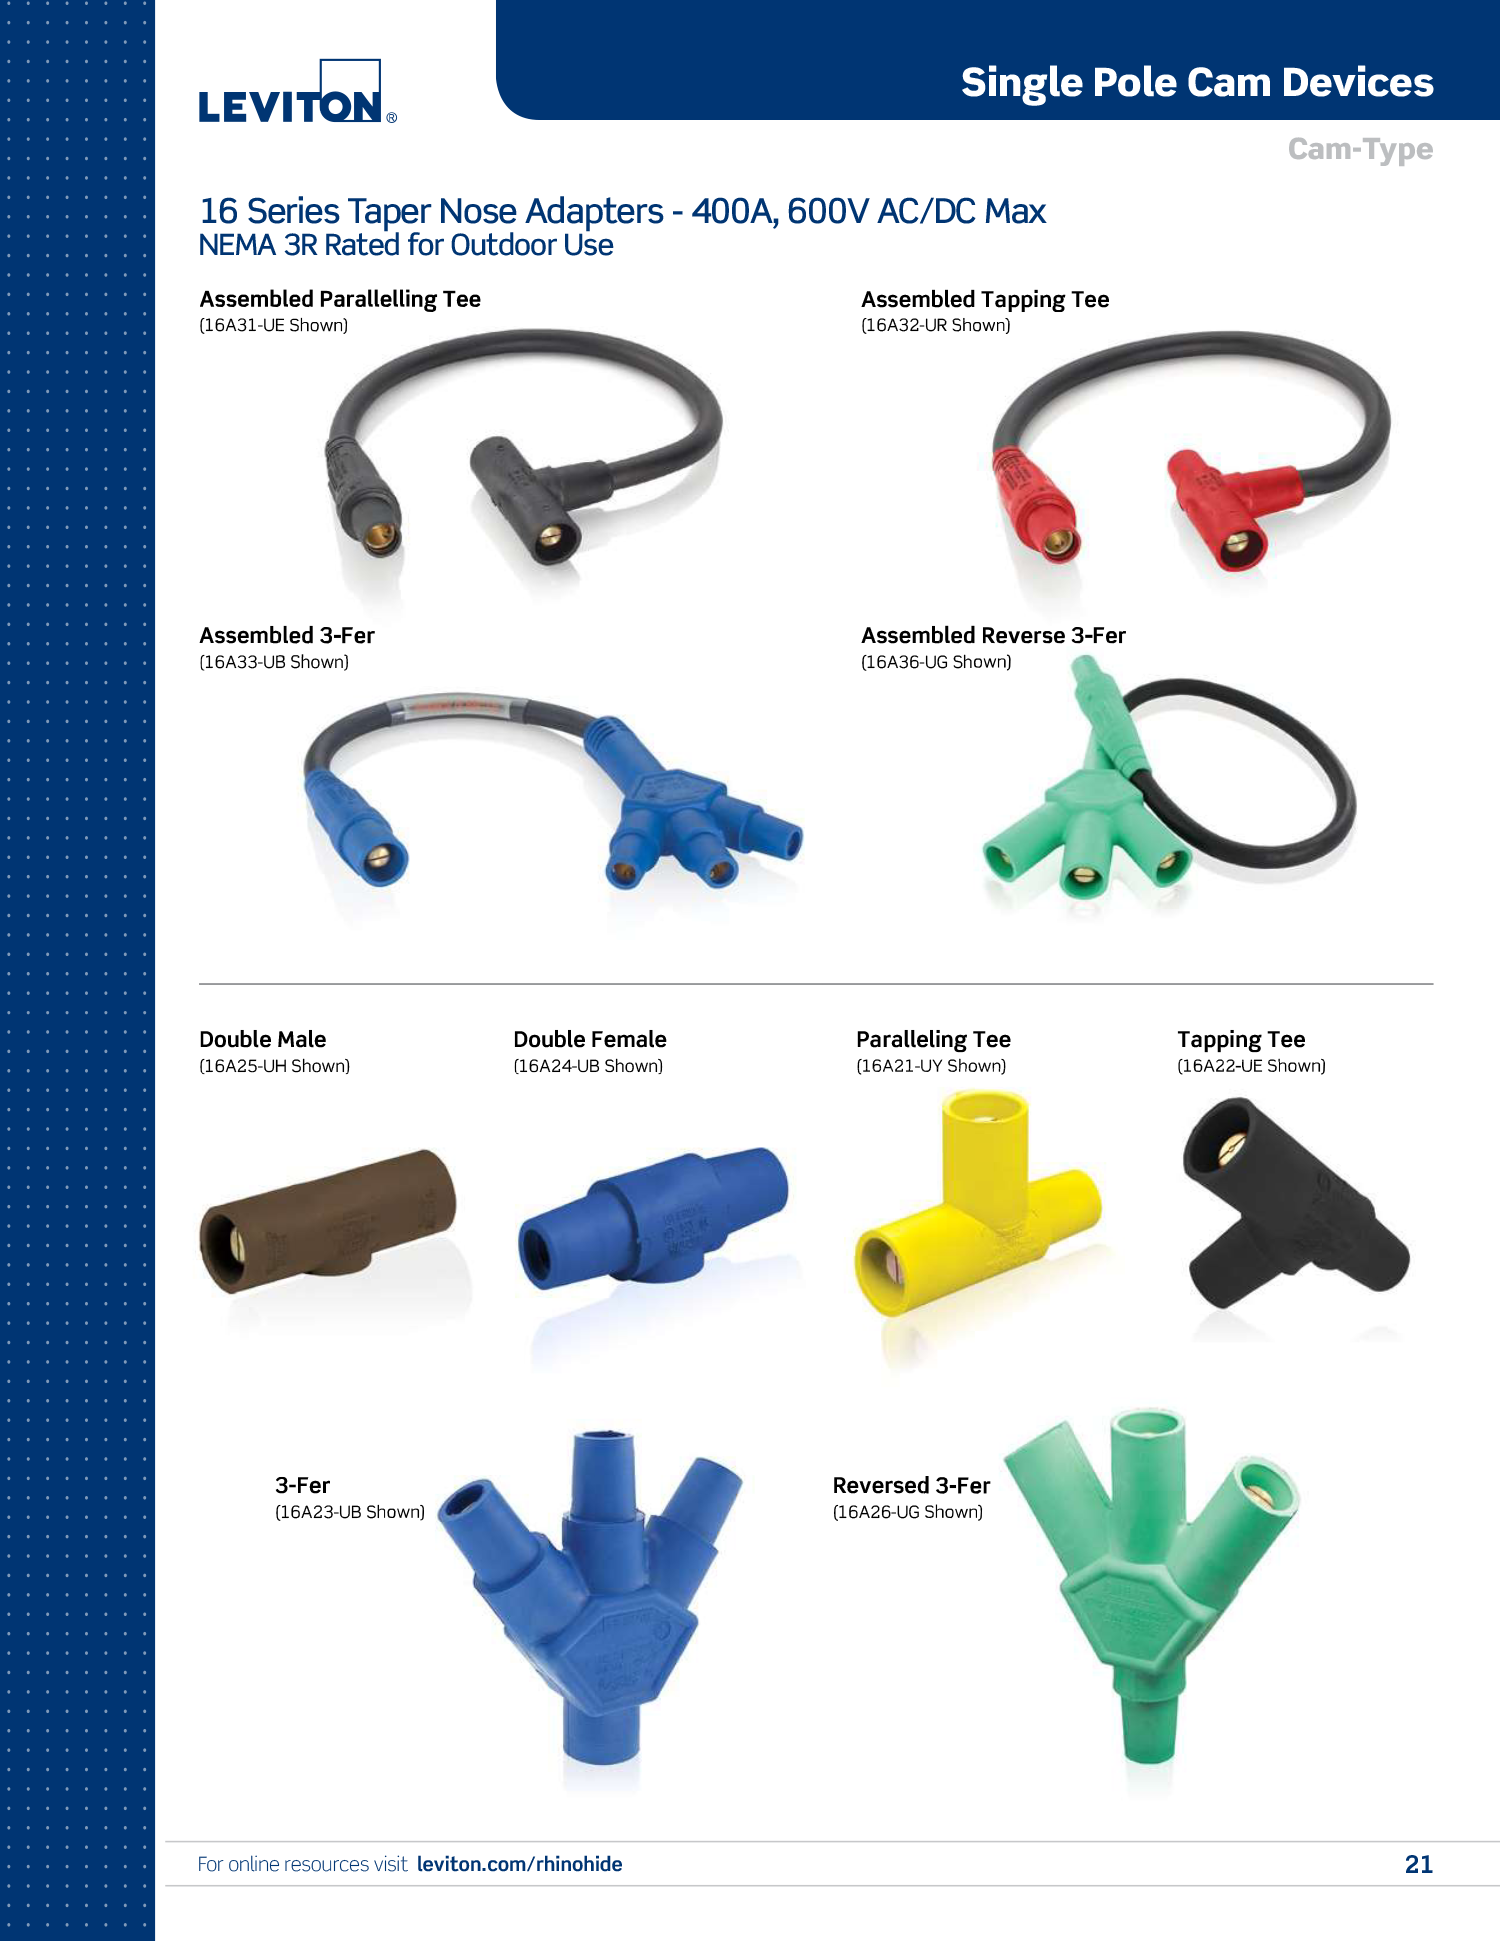 Single Pole Cam Accessories